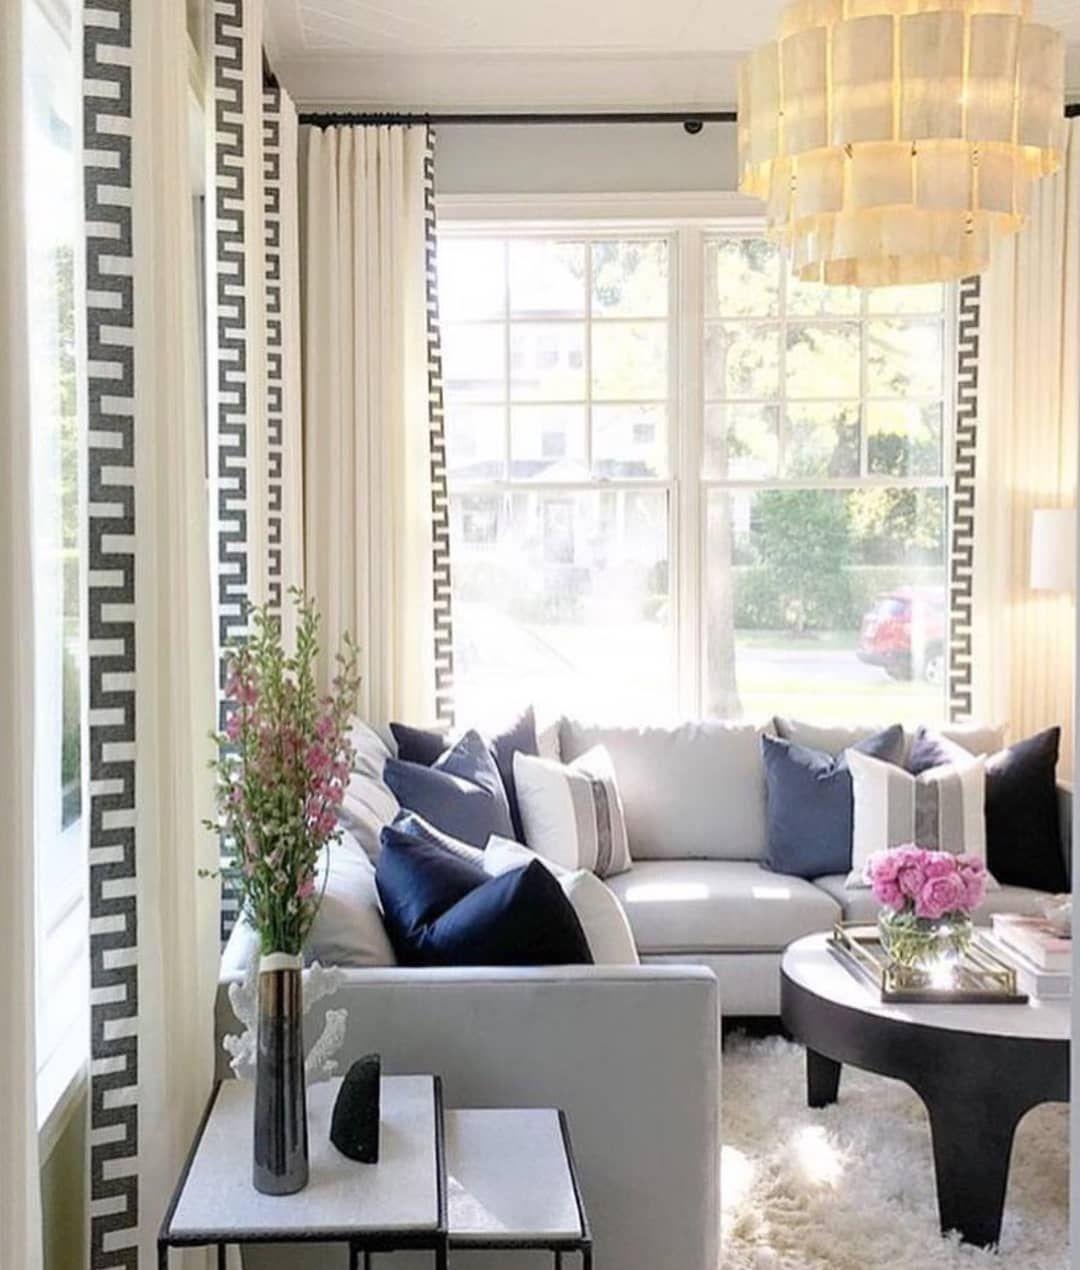 Schumacher Schumacher1889 Instagram Photos And Videos Living Room Blinds Curtains Living Room White Curtains #navy #living #room #curtains